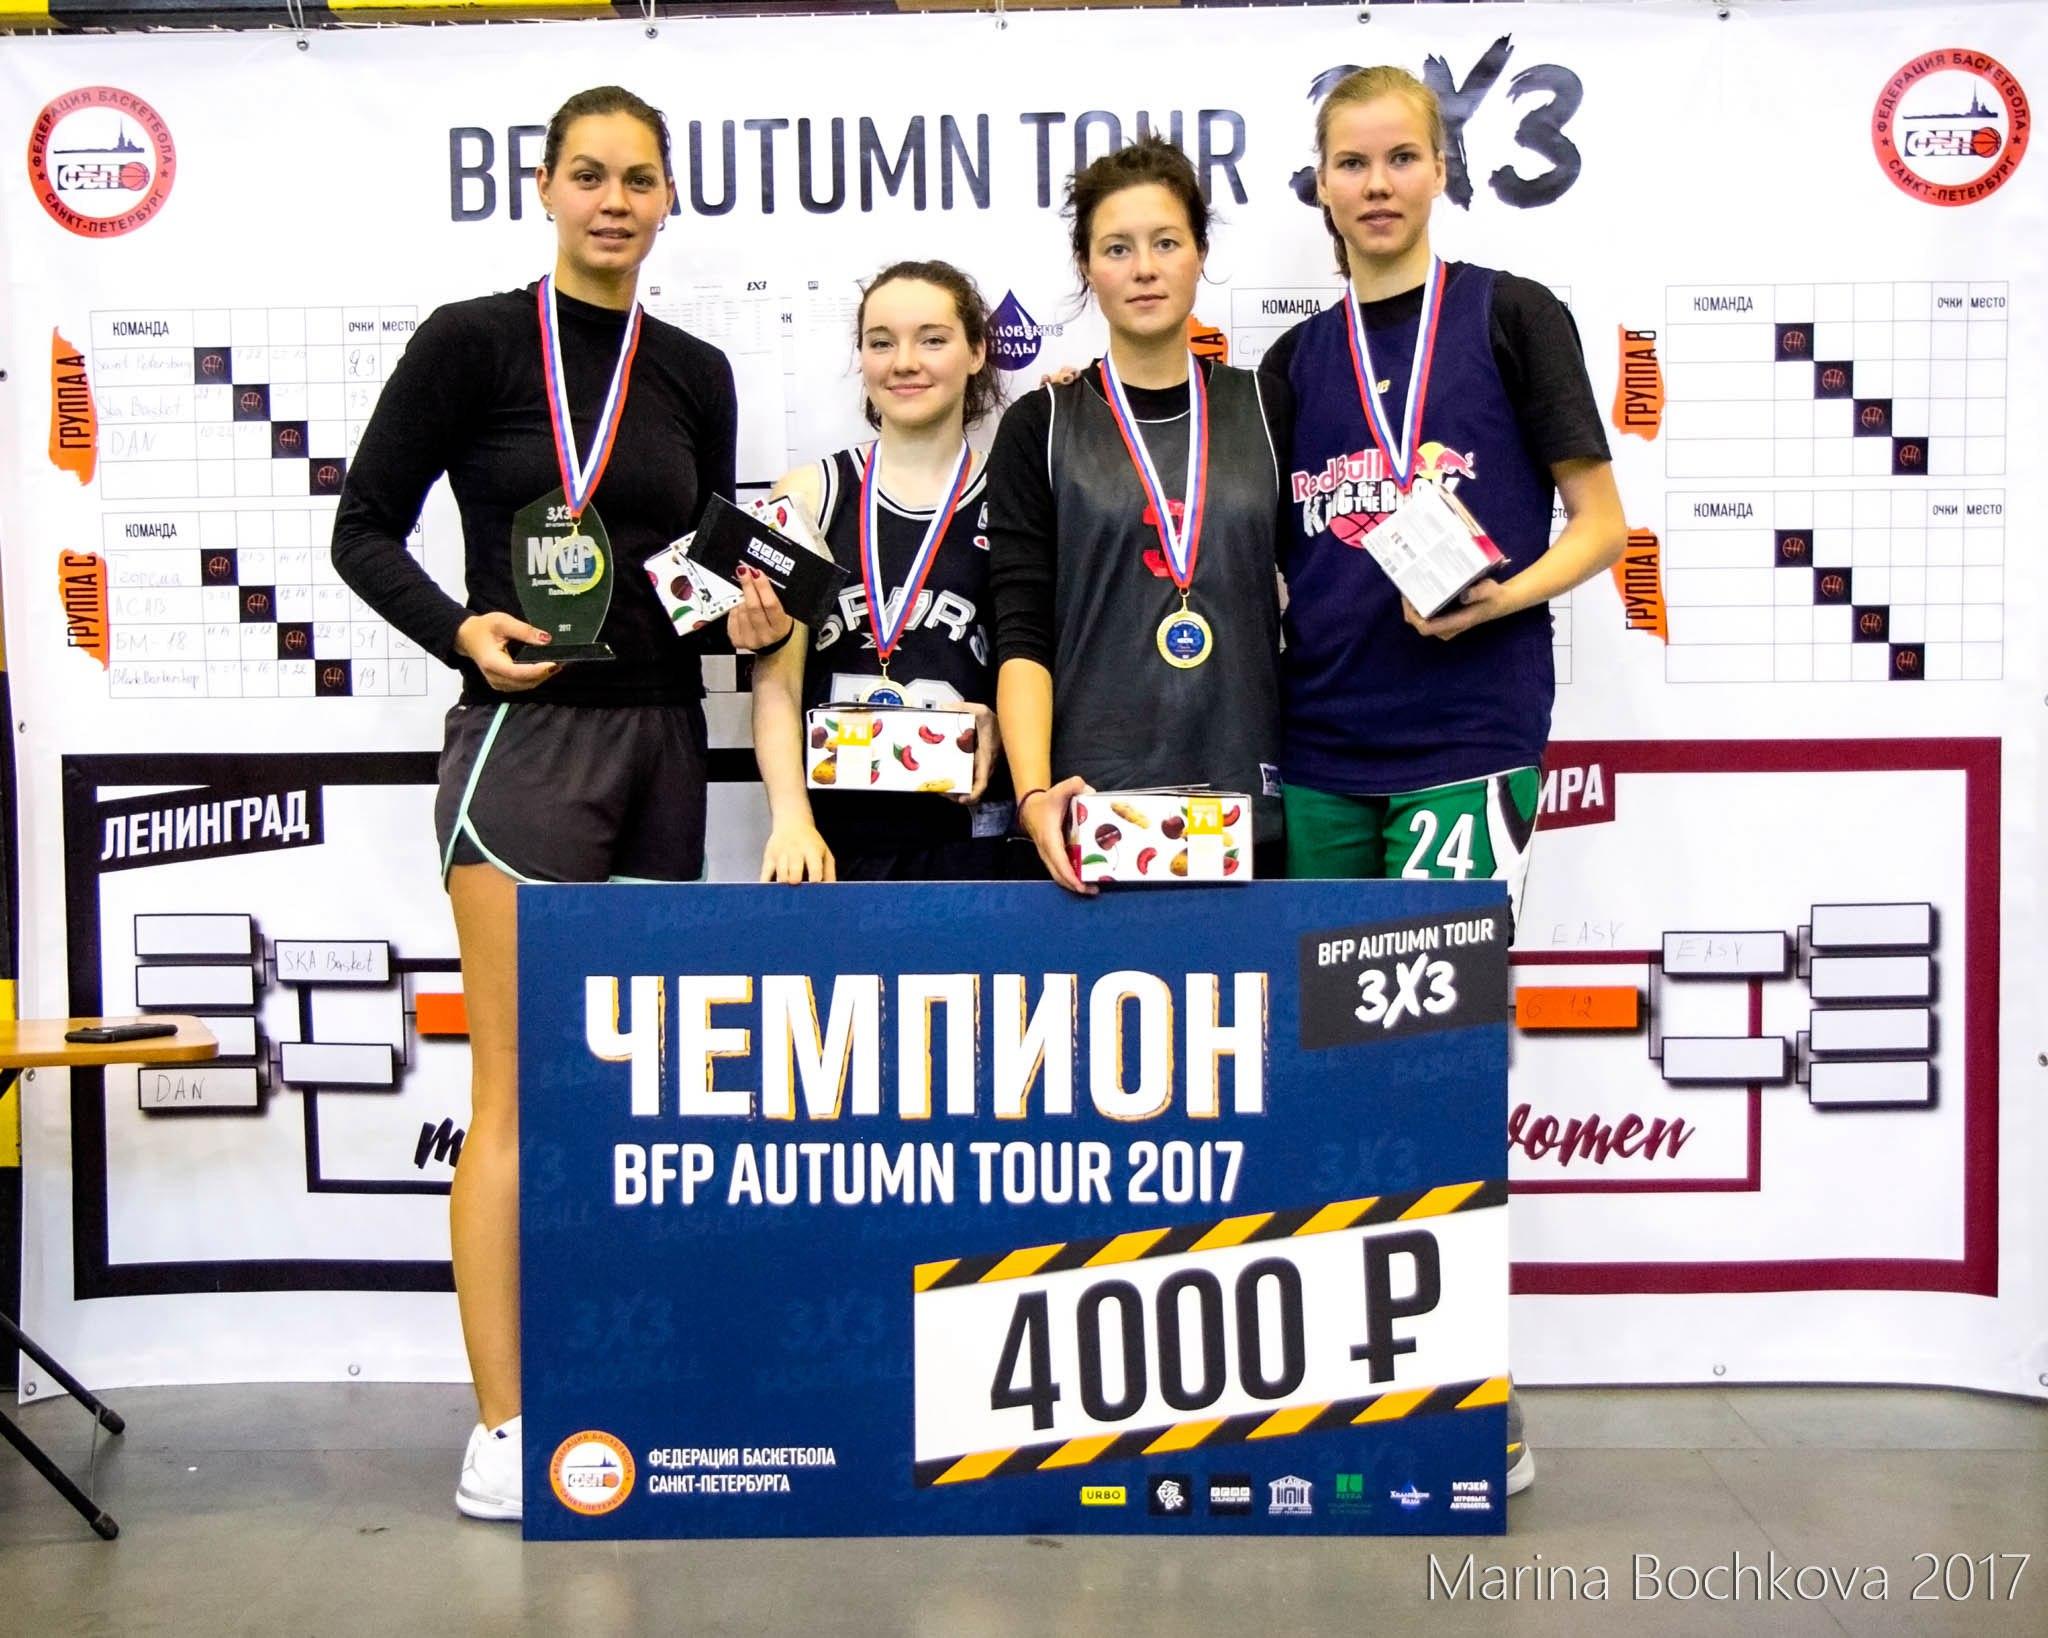 Татьяна Южакова - MVP Дивизиона «Северная пальмира» BFP Autumn Tour 3x3